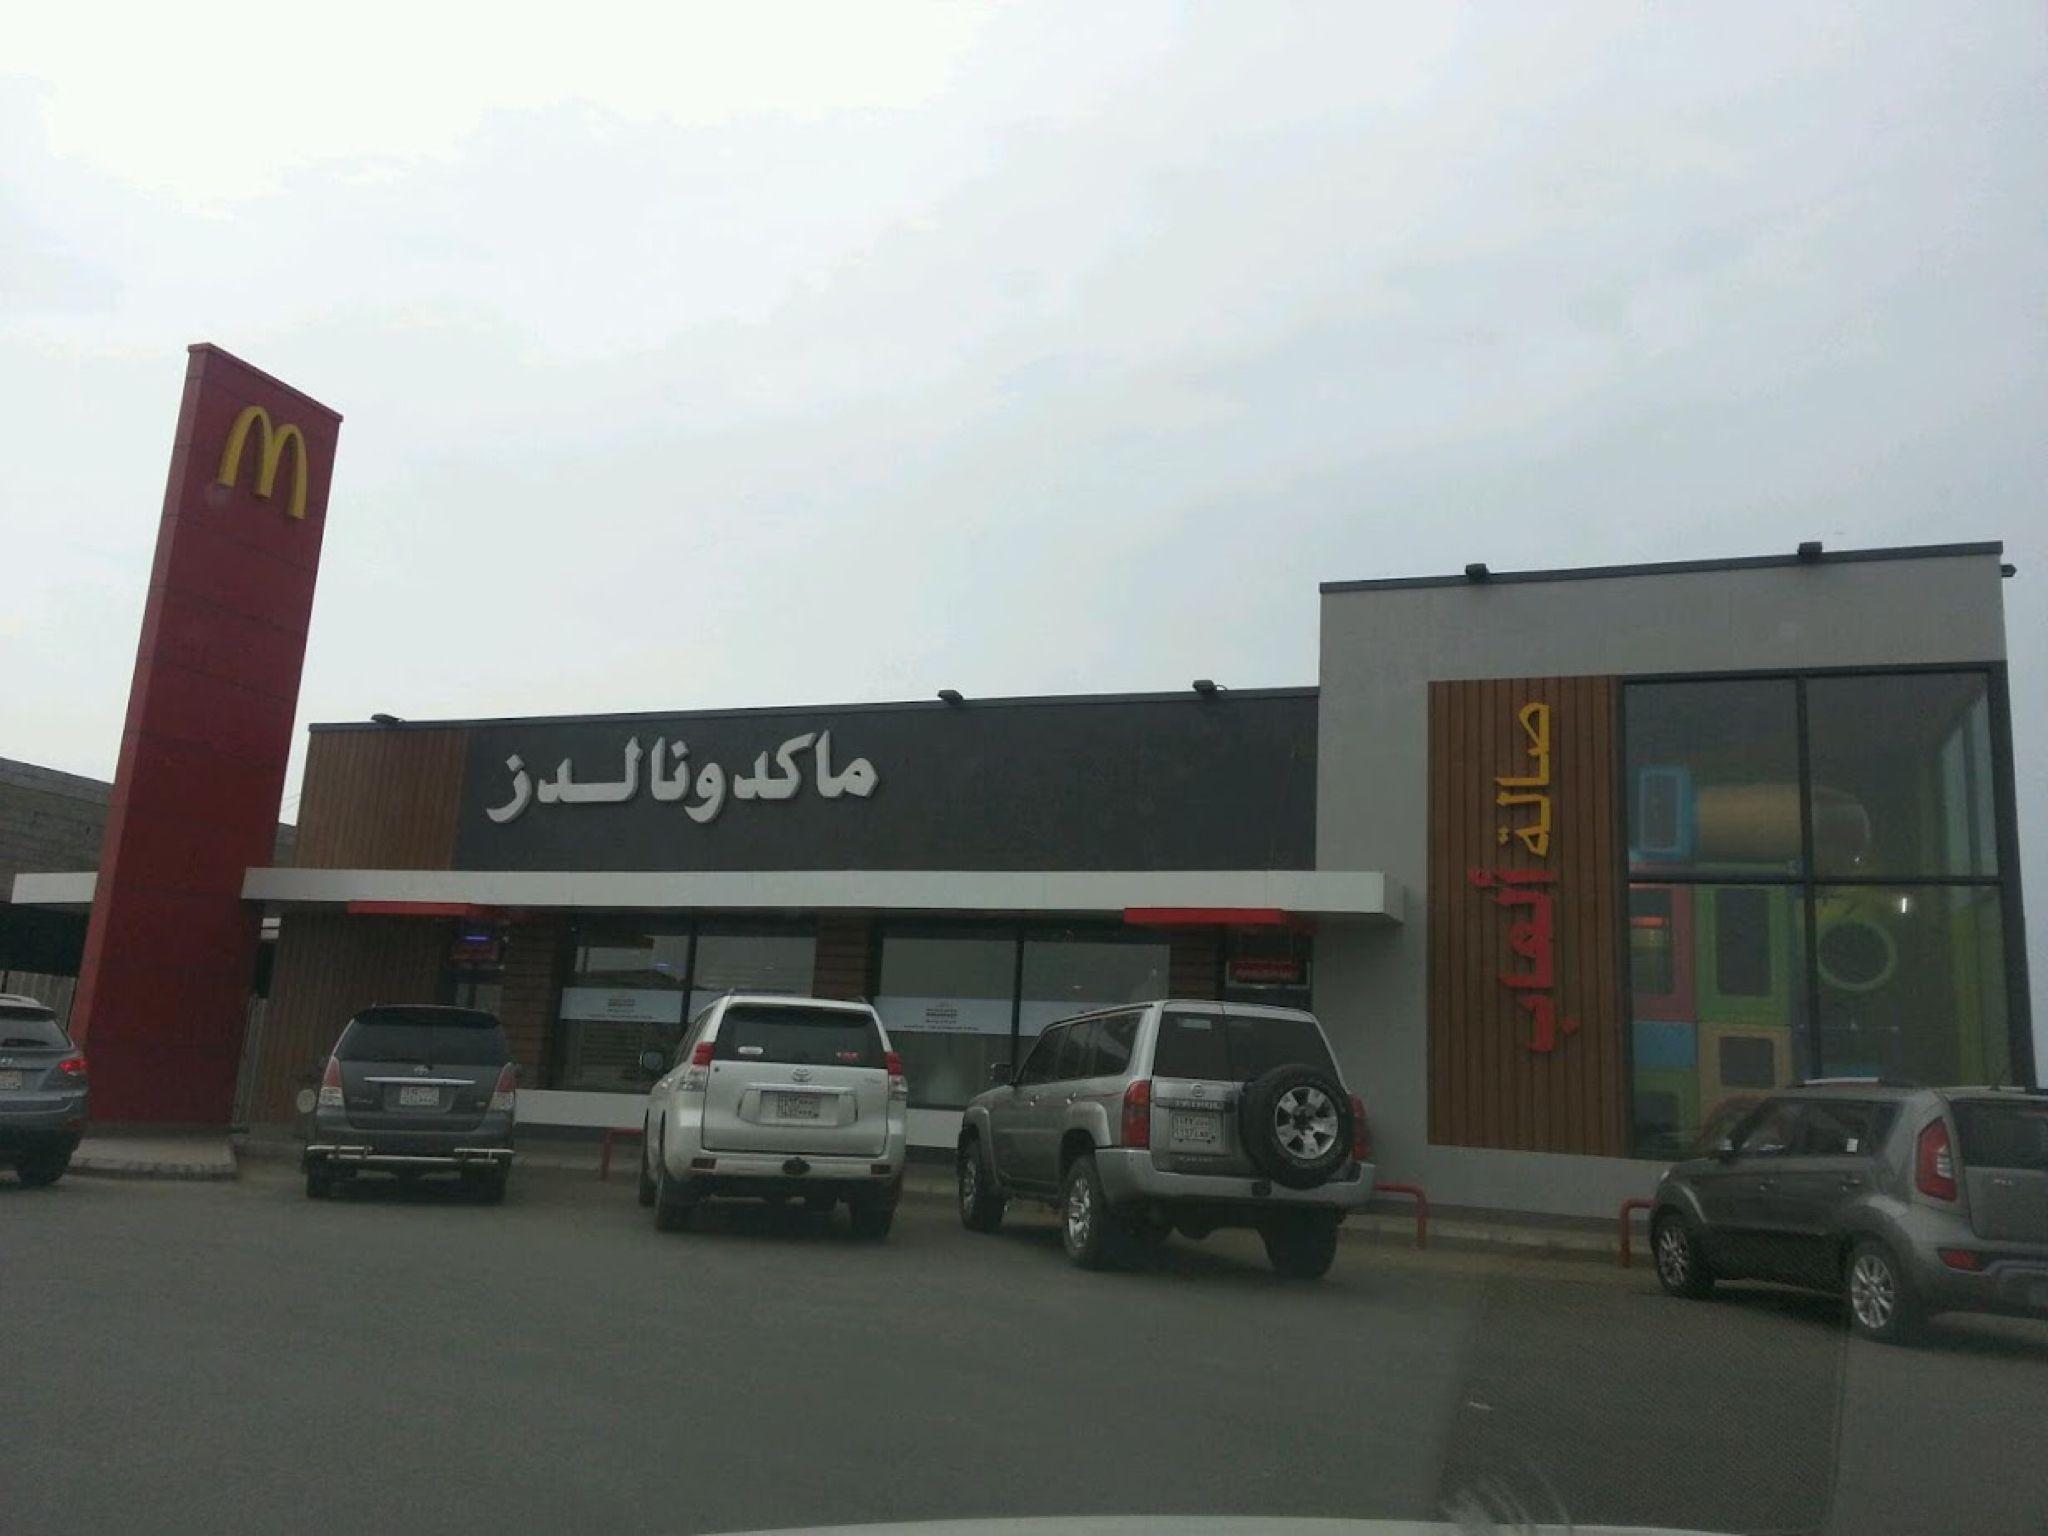 Mcdonalds Jazan Saudi Arabia Mcdonald S Restaurant Mcdonalds Saudi Arabia